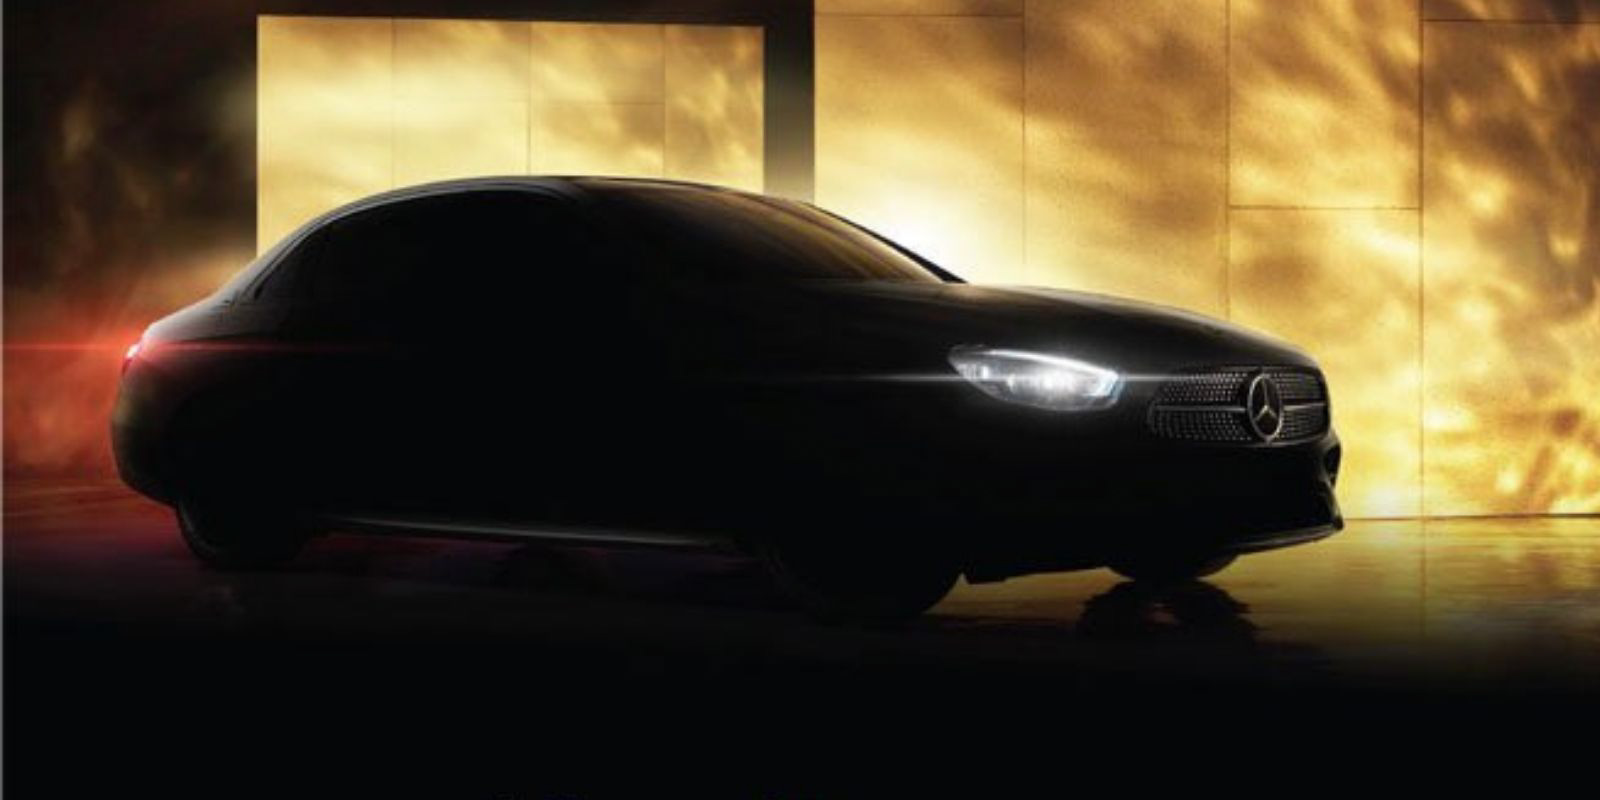 2021 Mercedes-Benz E-Class Facelift Teased; India Launch On March 16 - GaadiWaadi.com